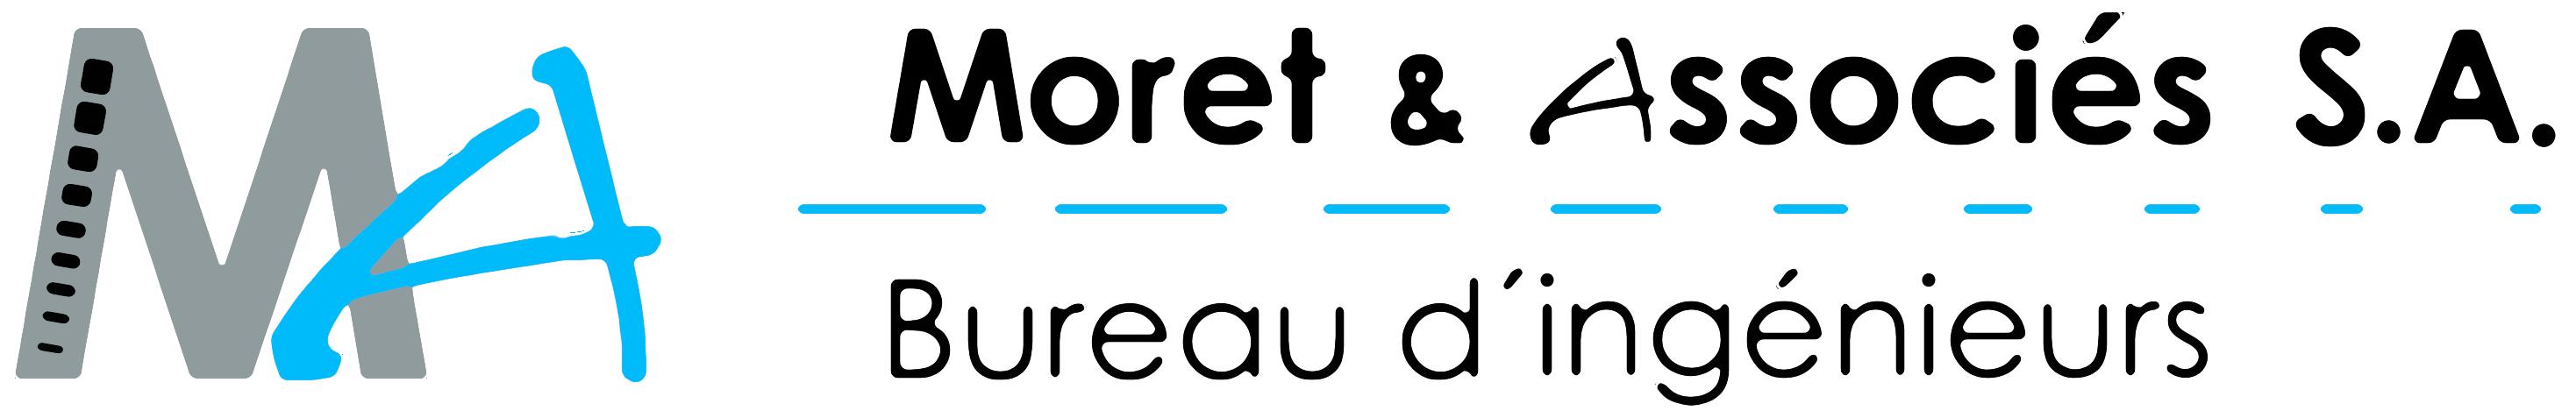 Moret & Associés SA